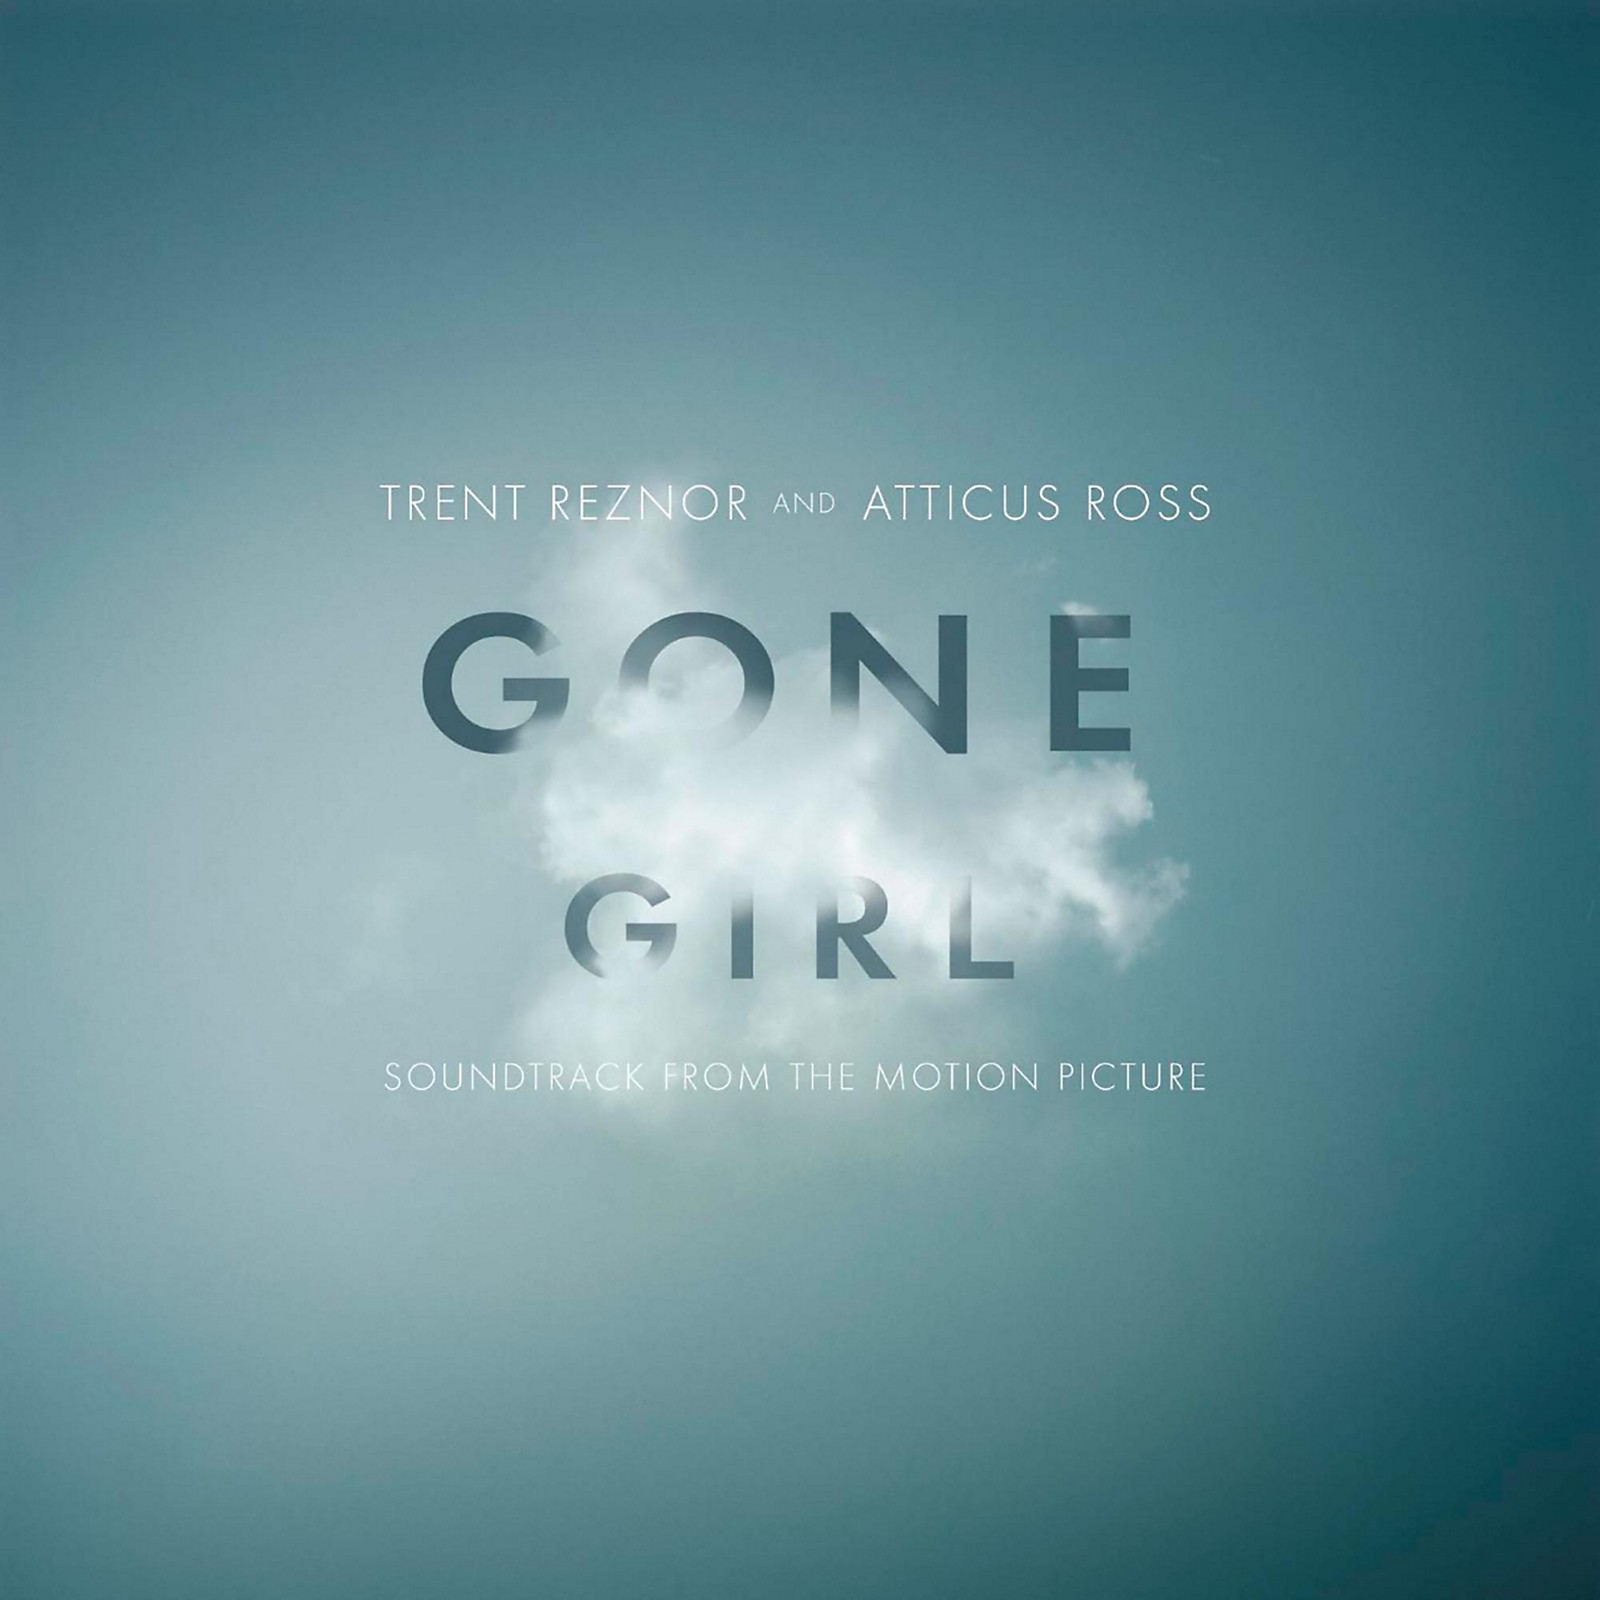 Sony Trent Reznor & Atticus Ross - Gone Girl (Soundtrack)